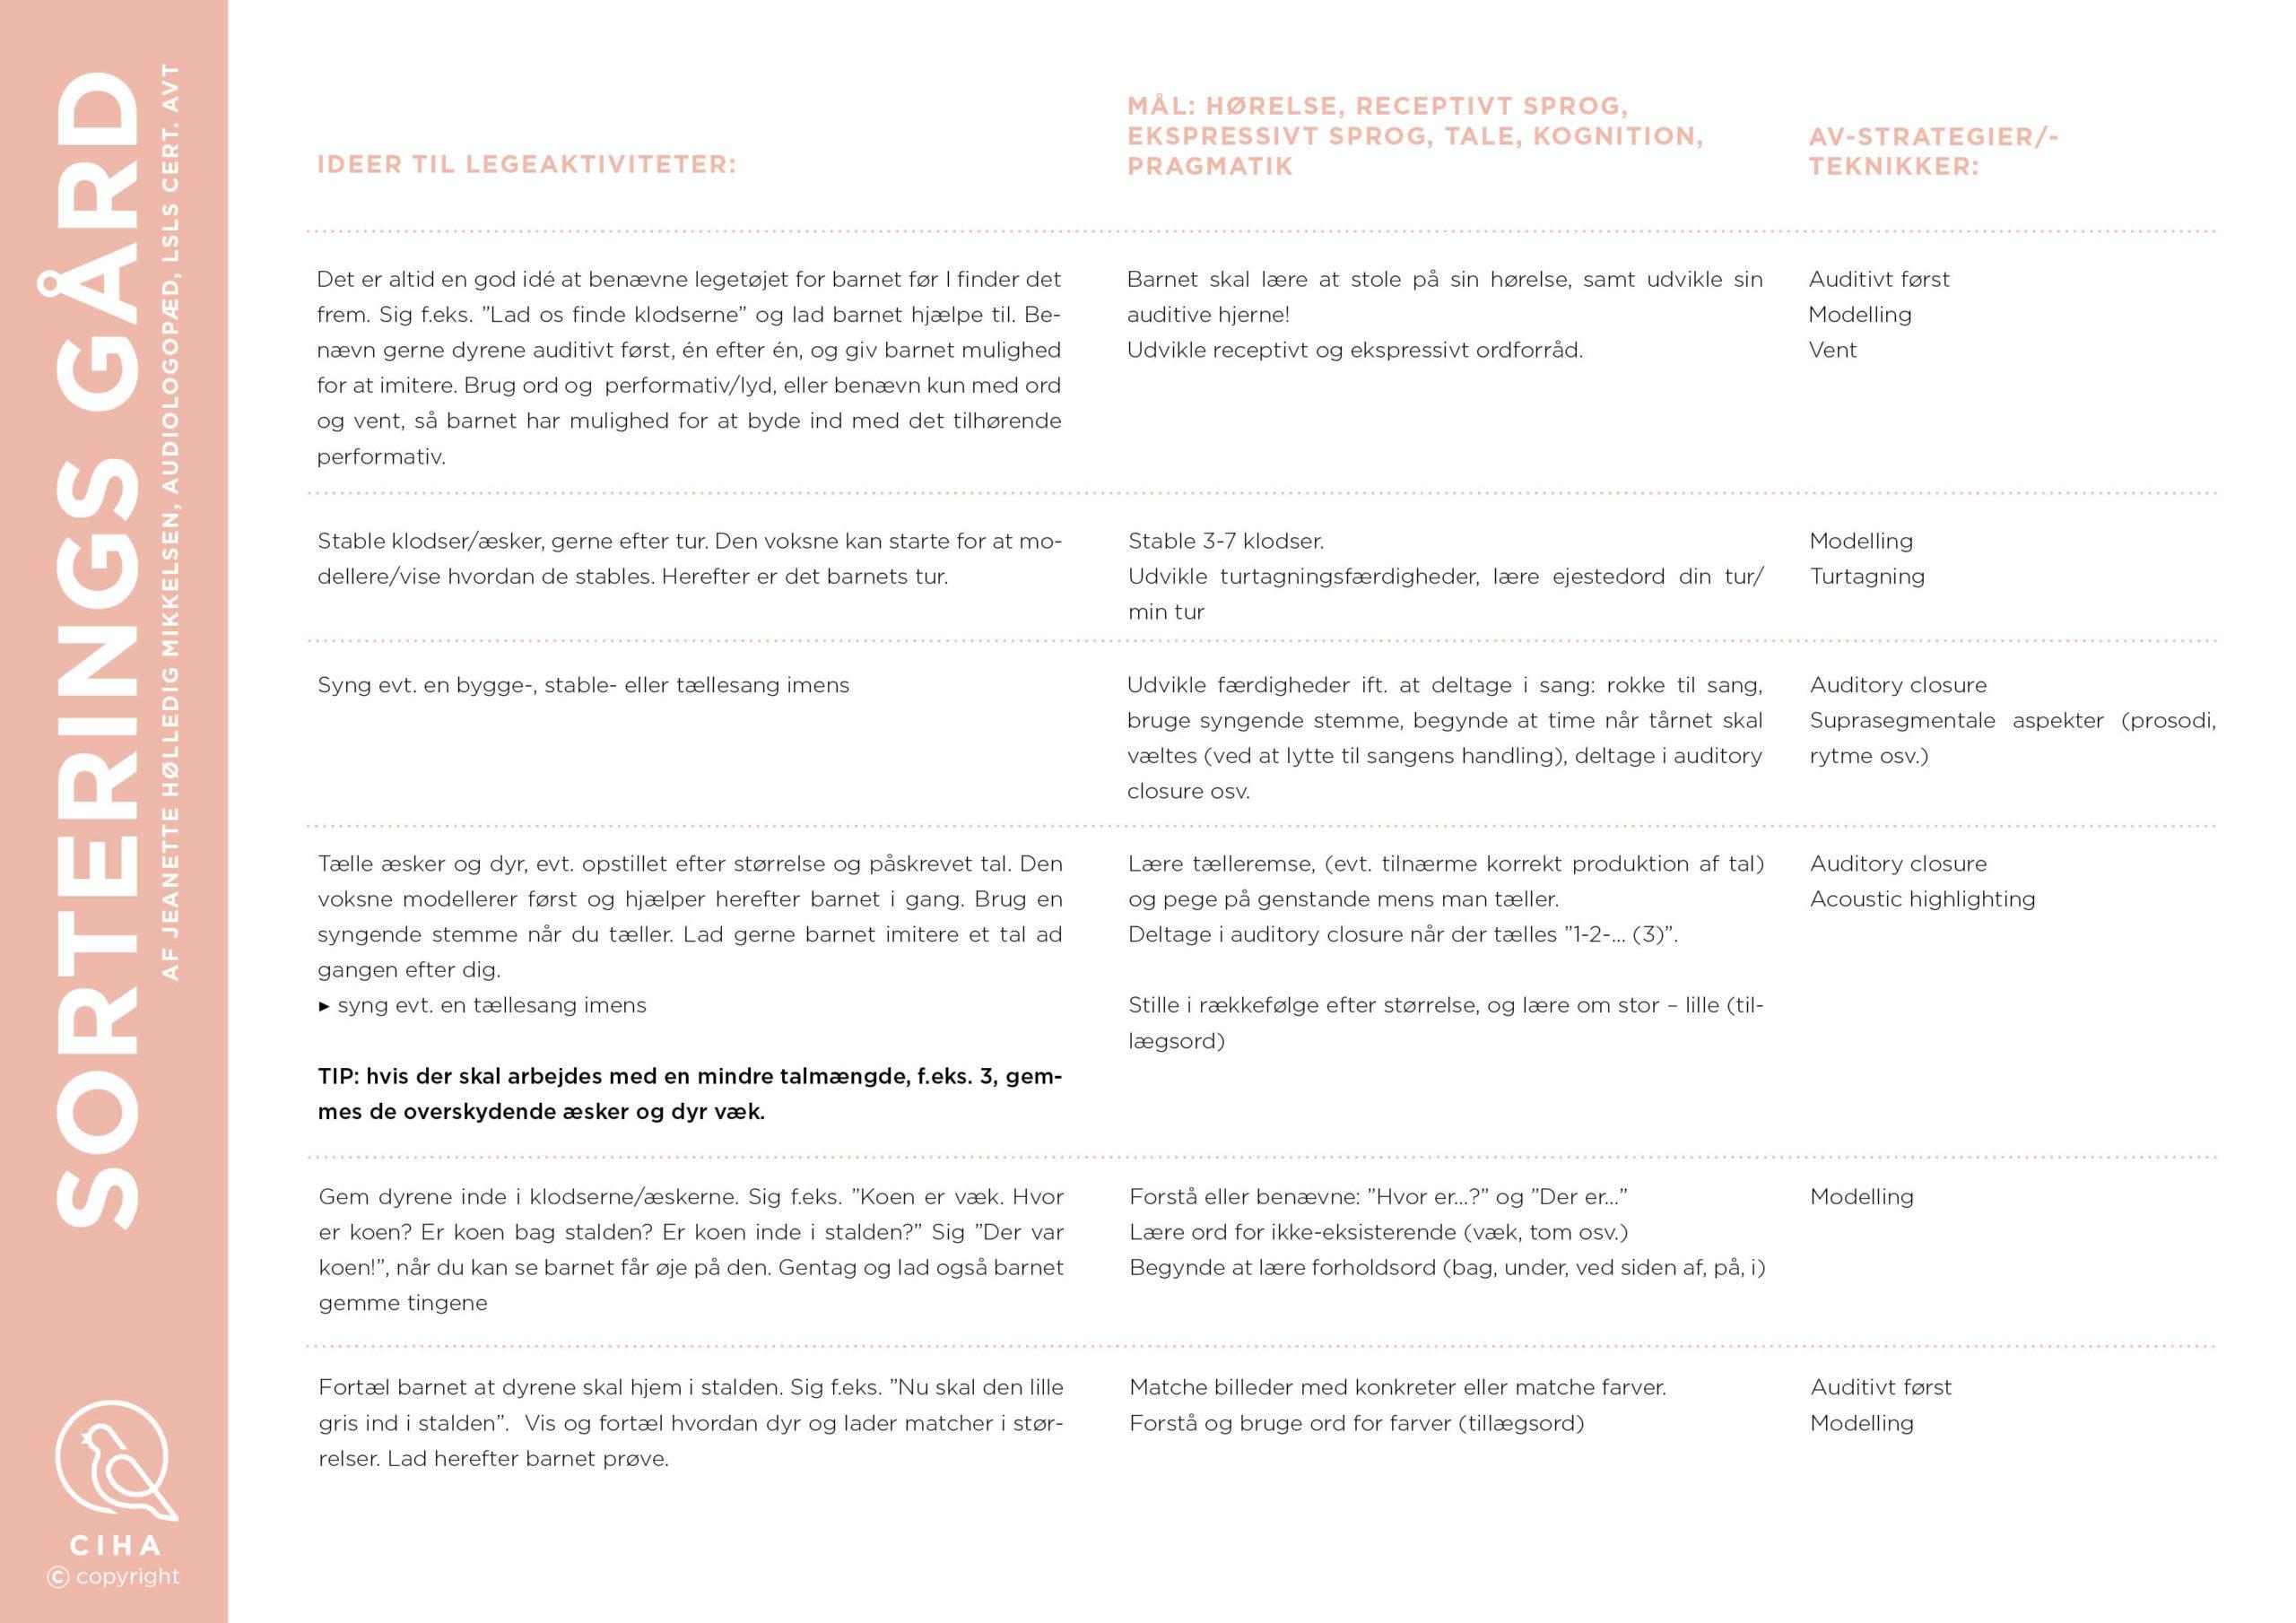 Bondegård avt guideline, avt vejledning, bondegård med dyr, sprogtræning, sprogstimulering